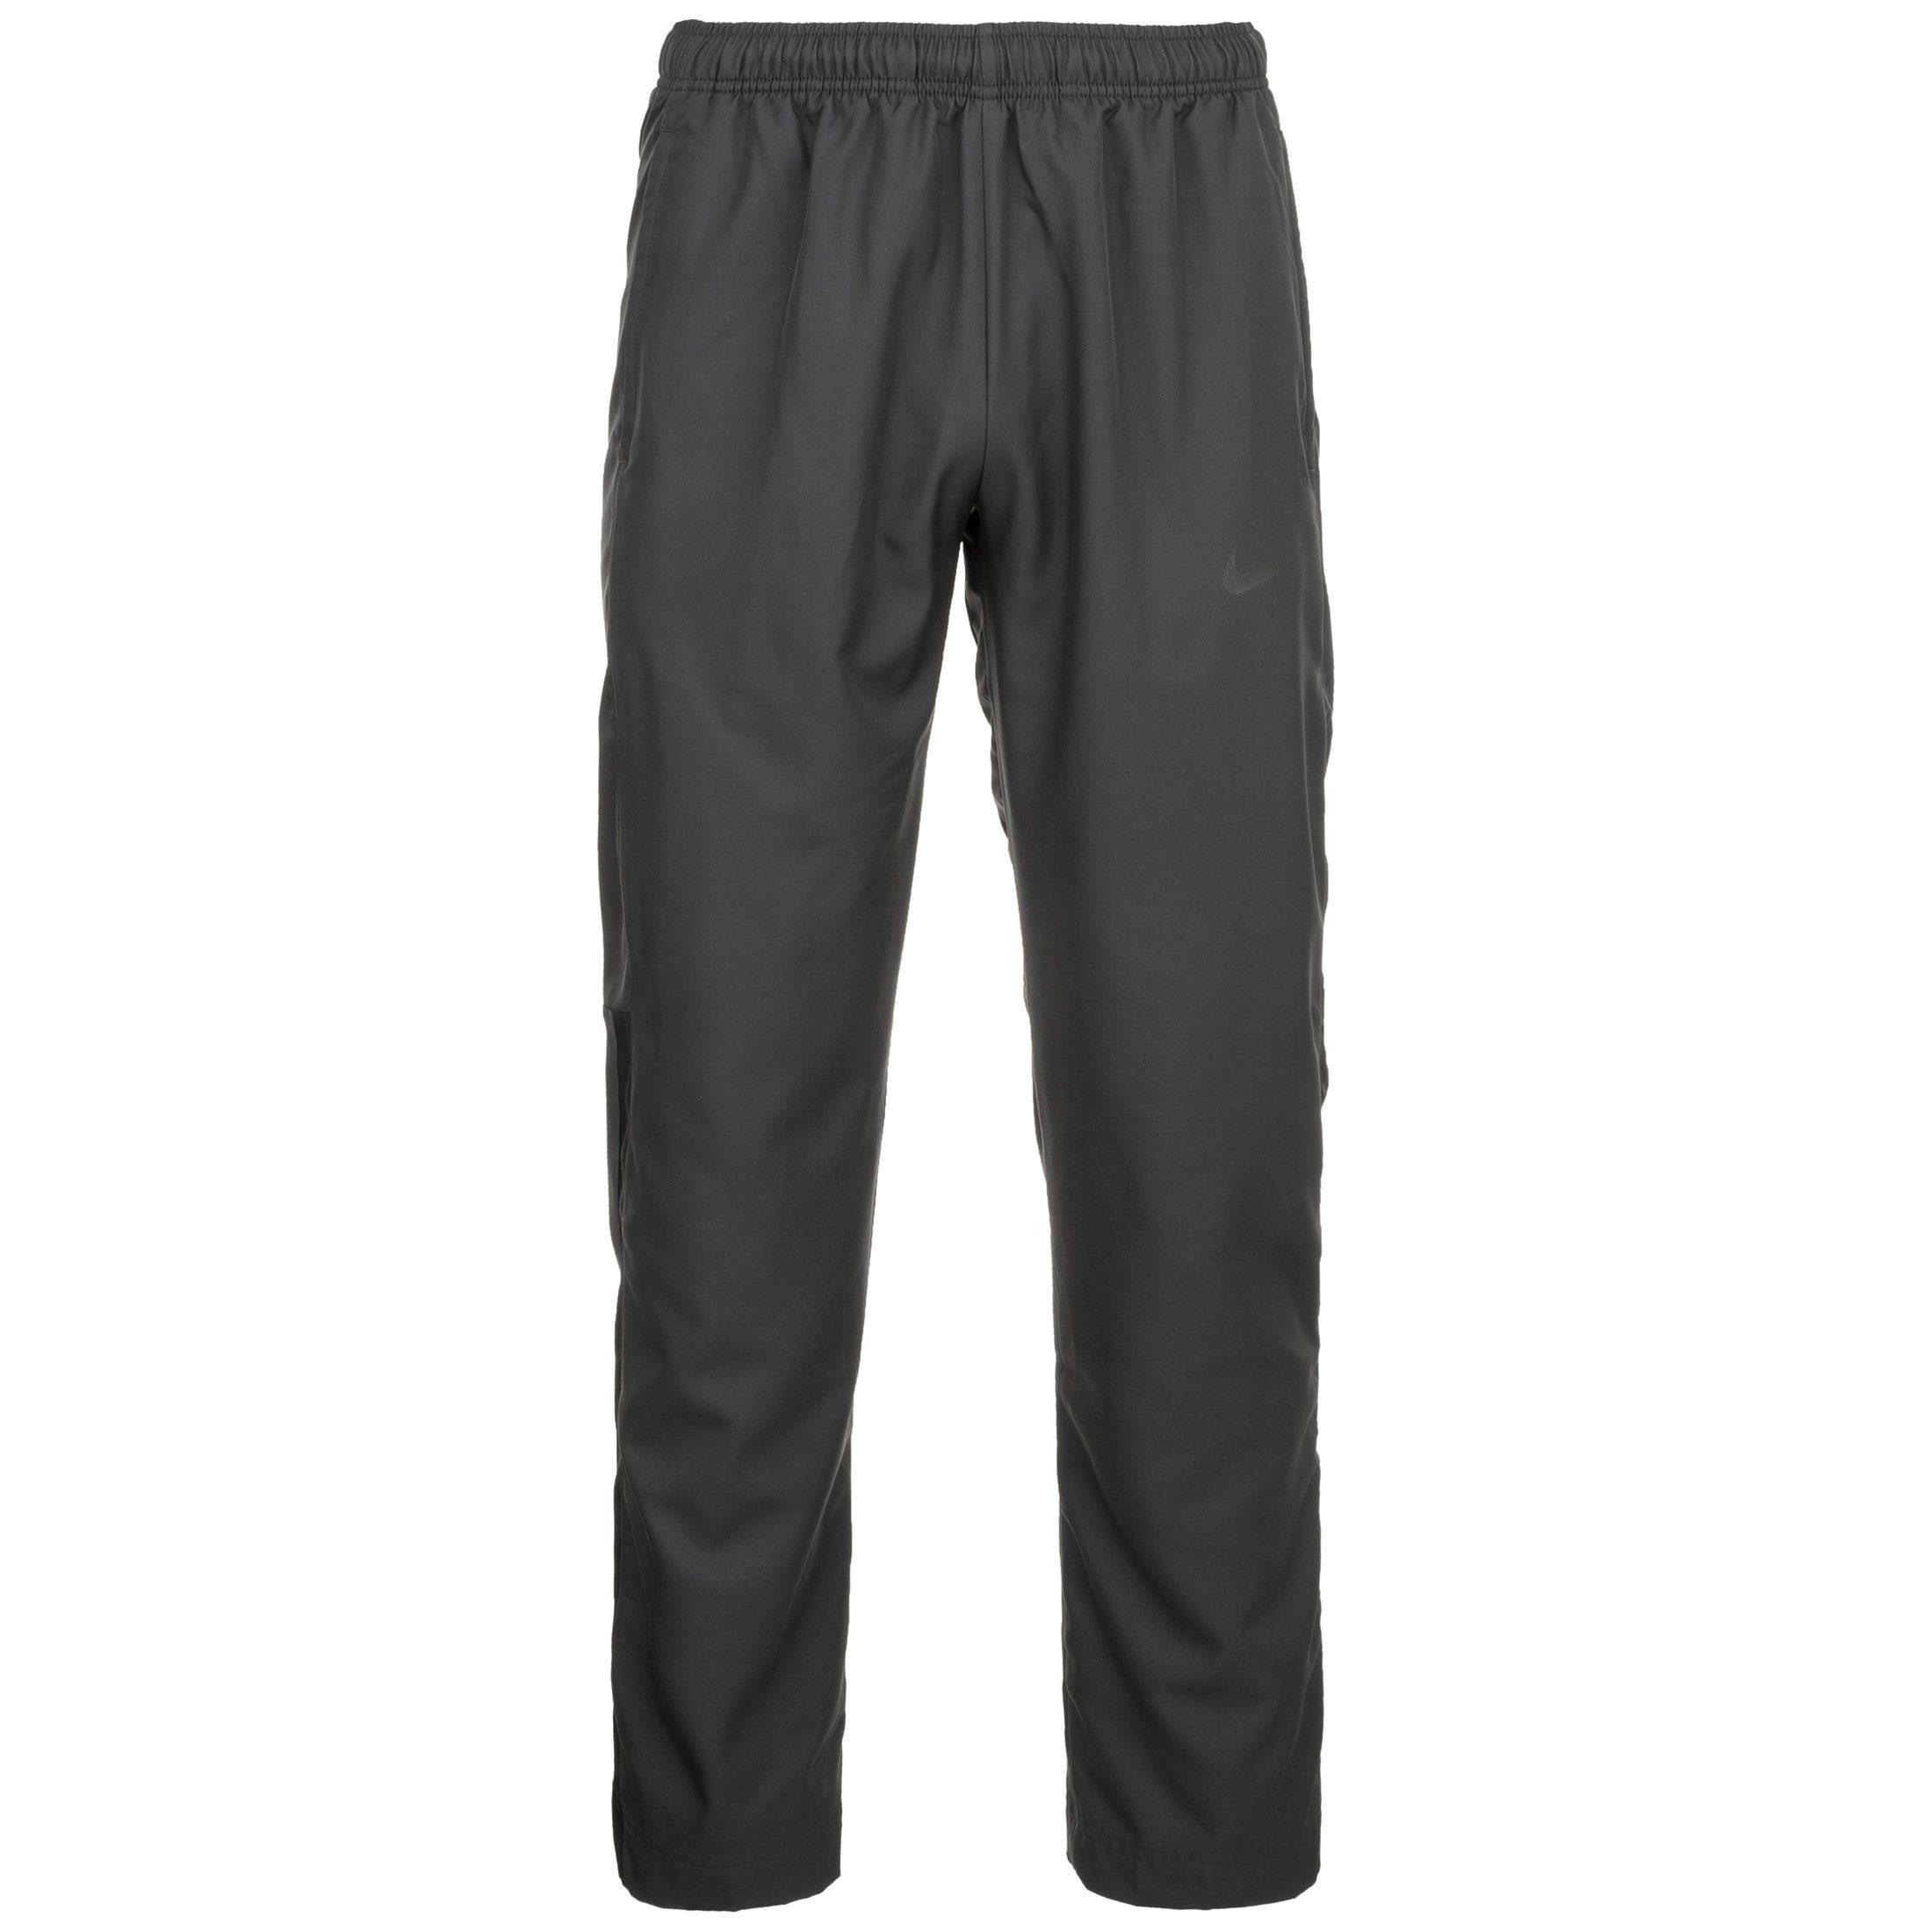 Nike Trainingshose Dry Woven | Sportbekleidung > Sporthosen > Trainingshosen | Schwarz | Ab | Nike